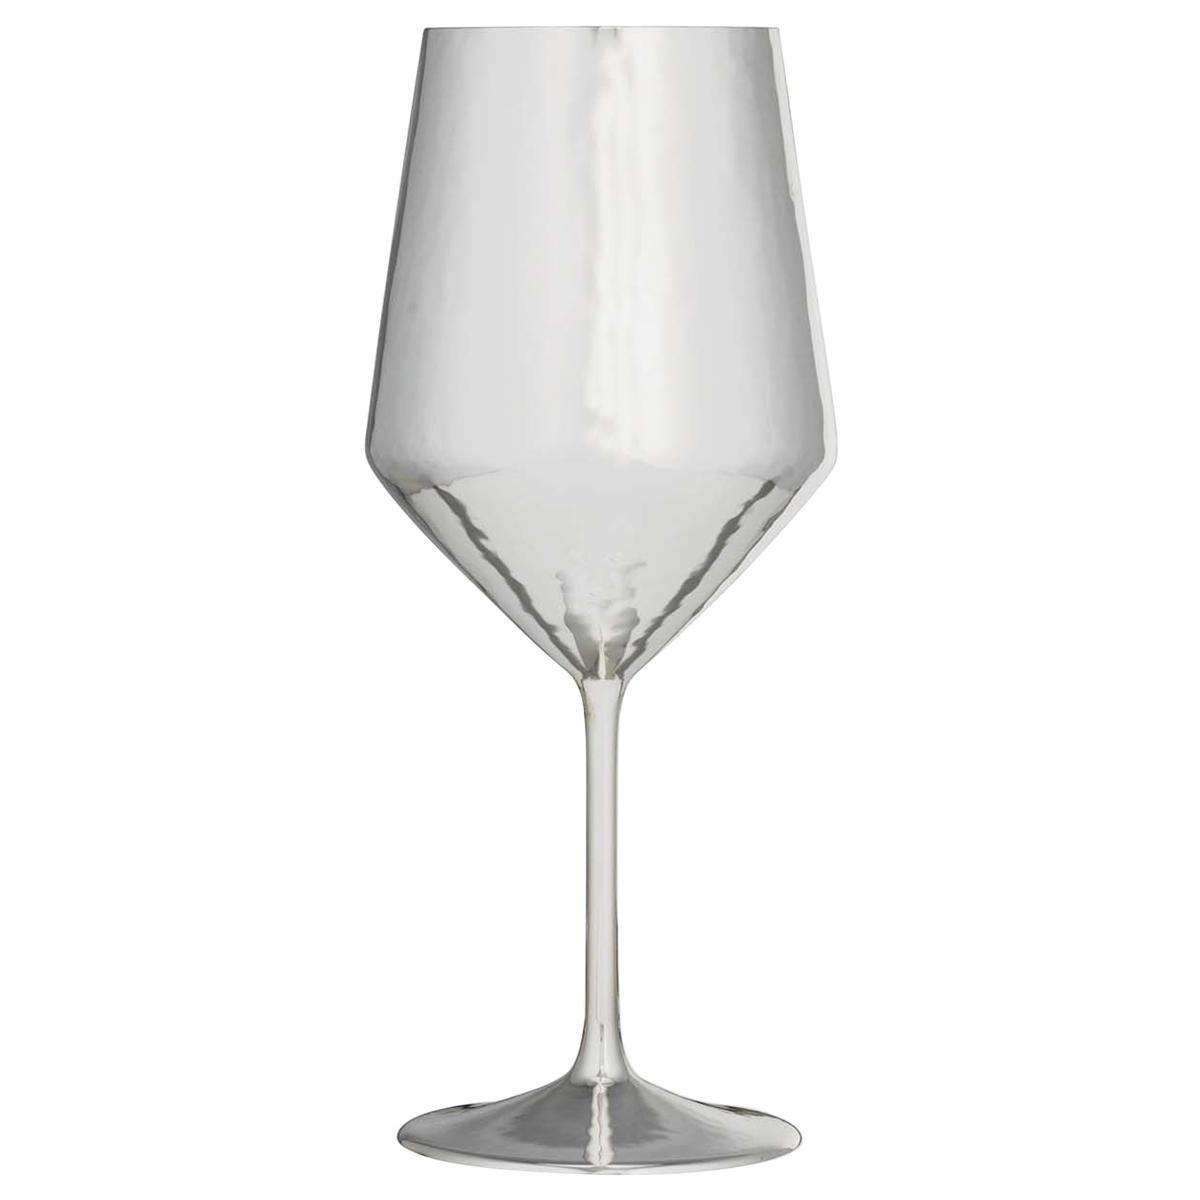 High 1 Goblet Glass